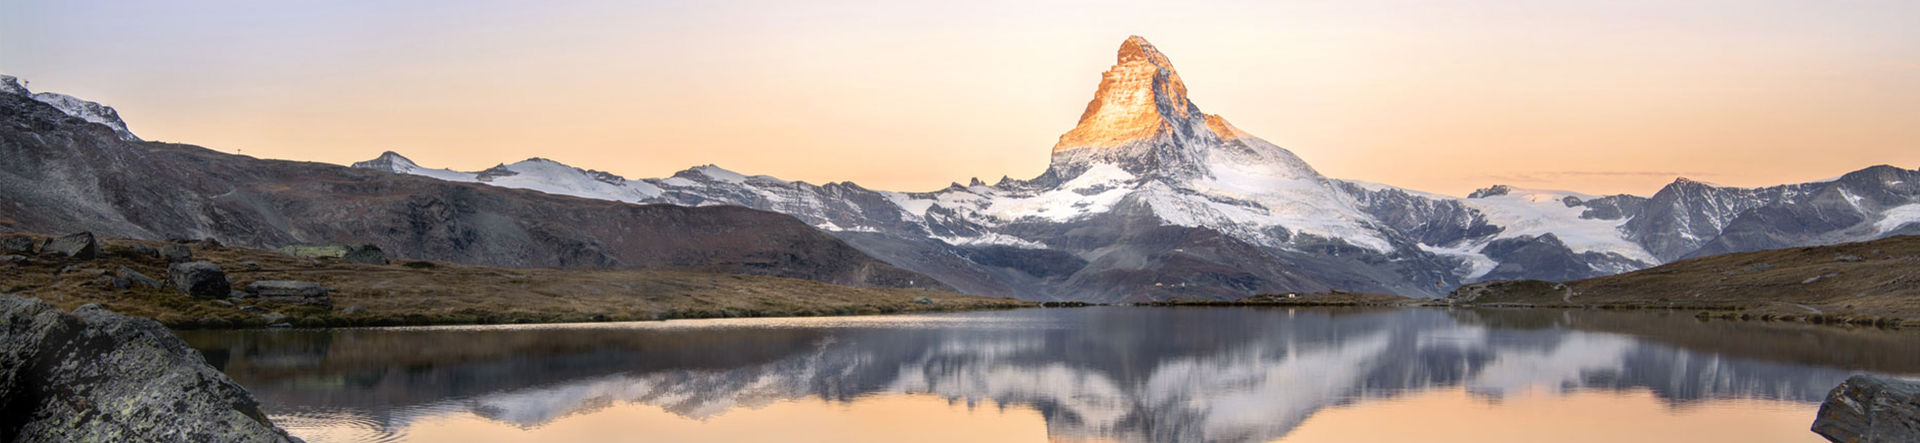 Swiss Top 25